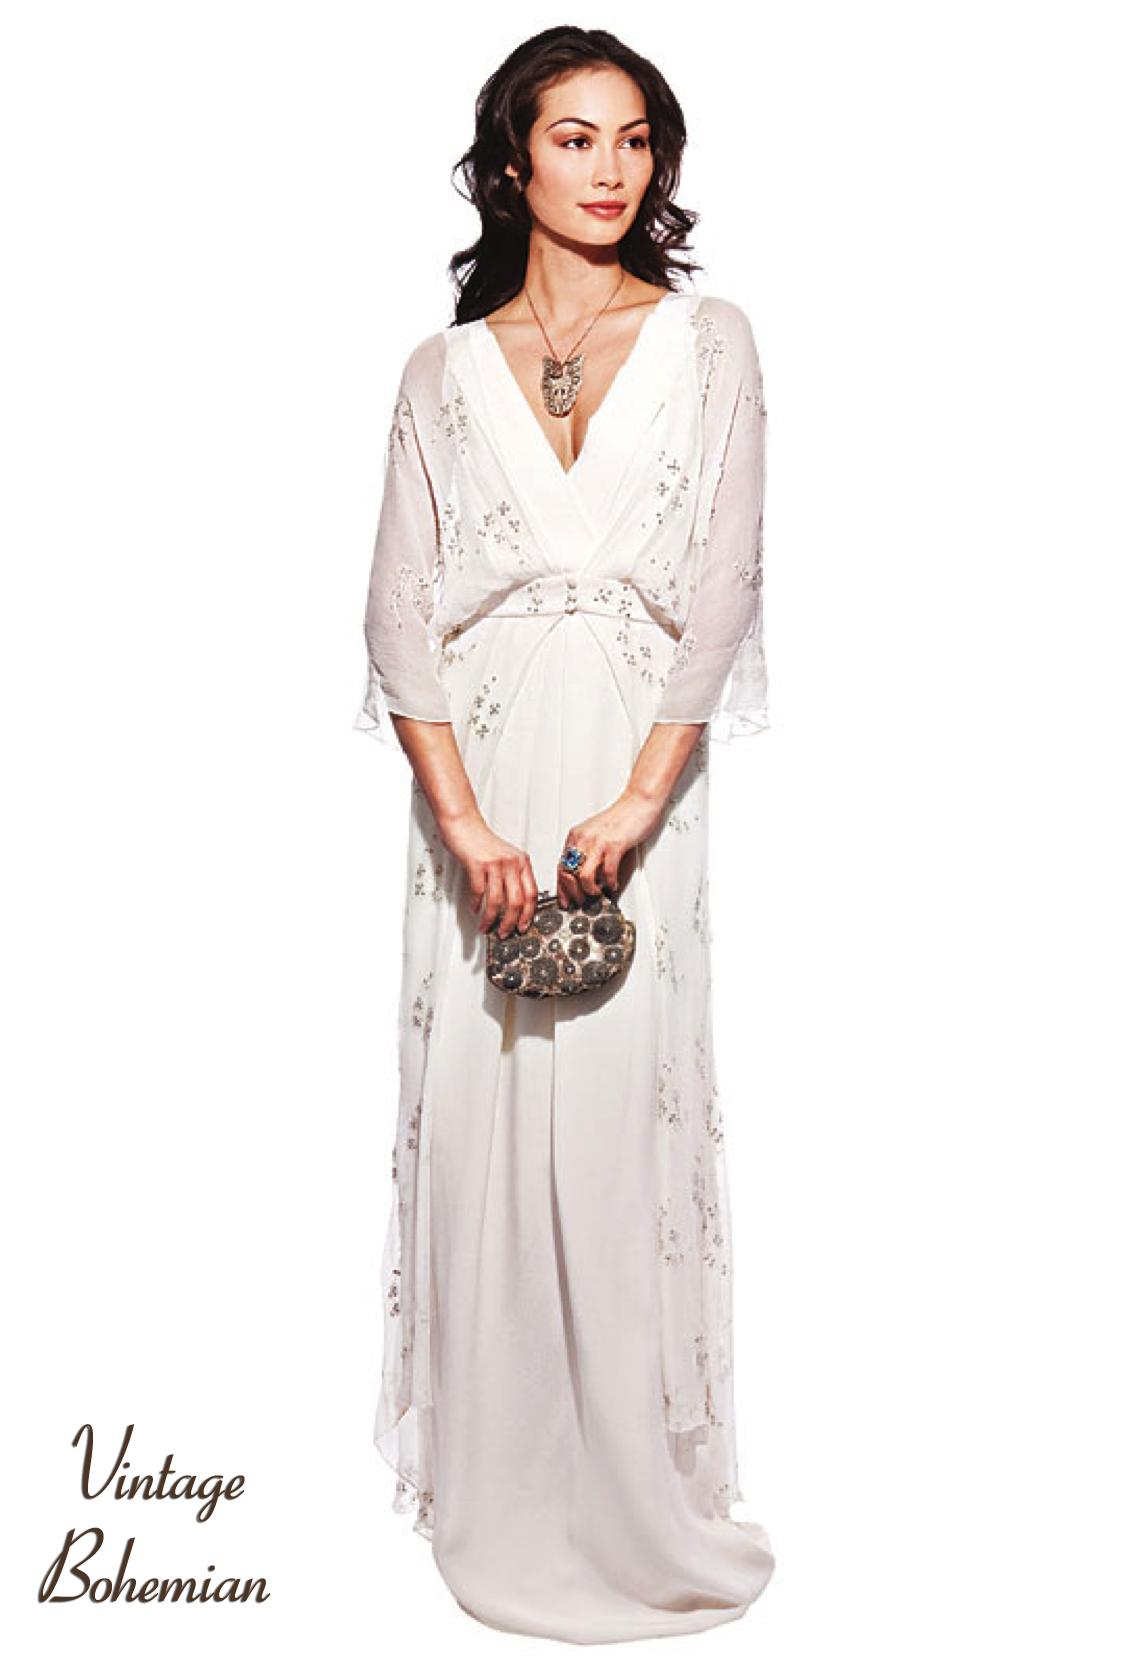 Bohemian style wedding dresses nyc Dress blog Edin